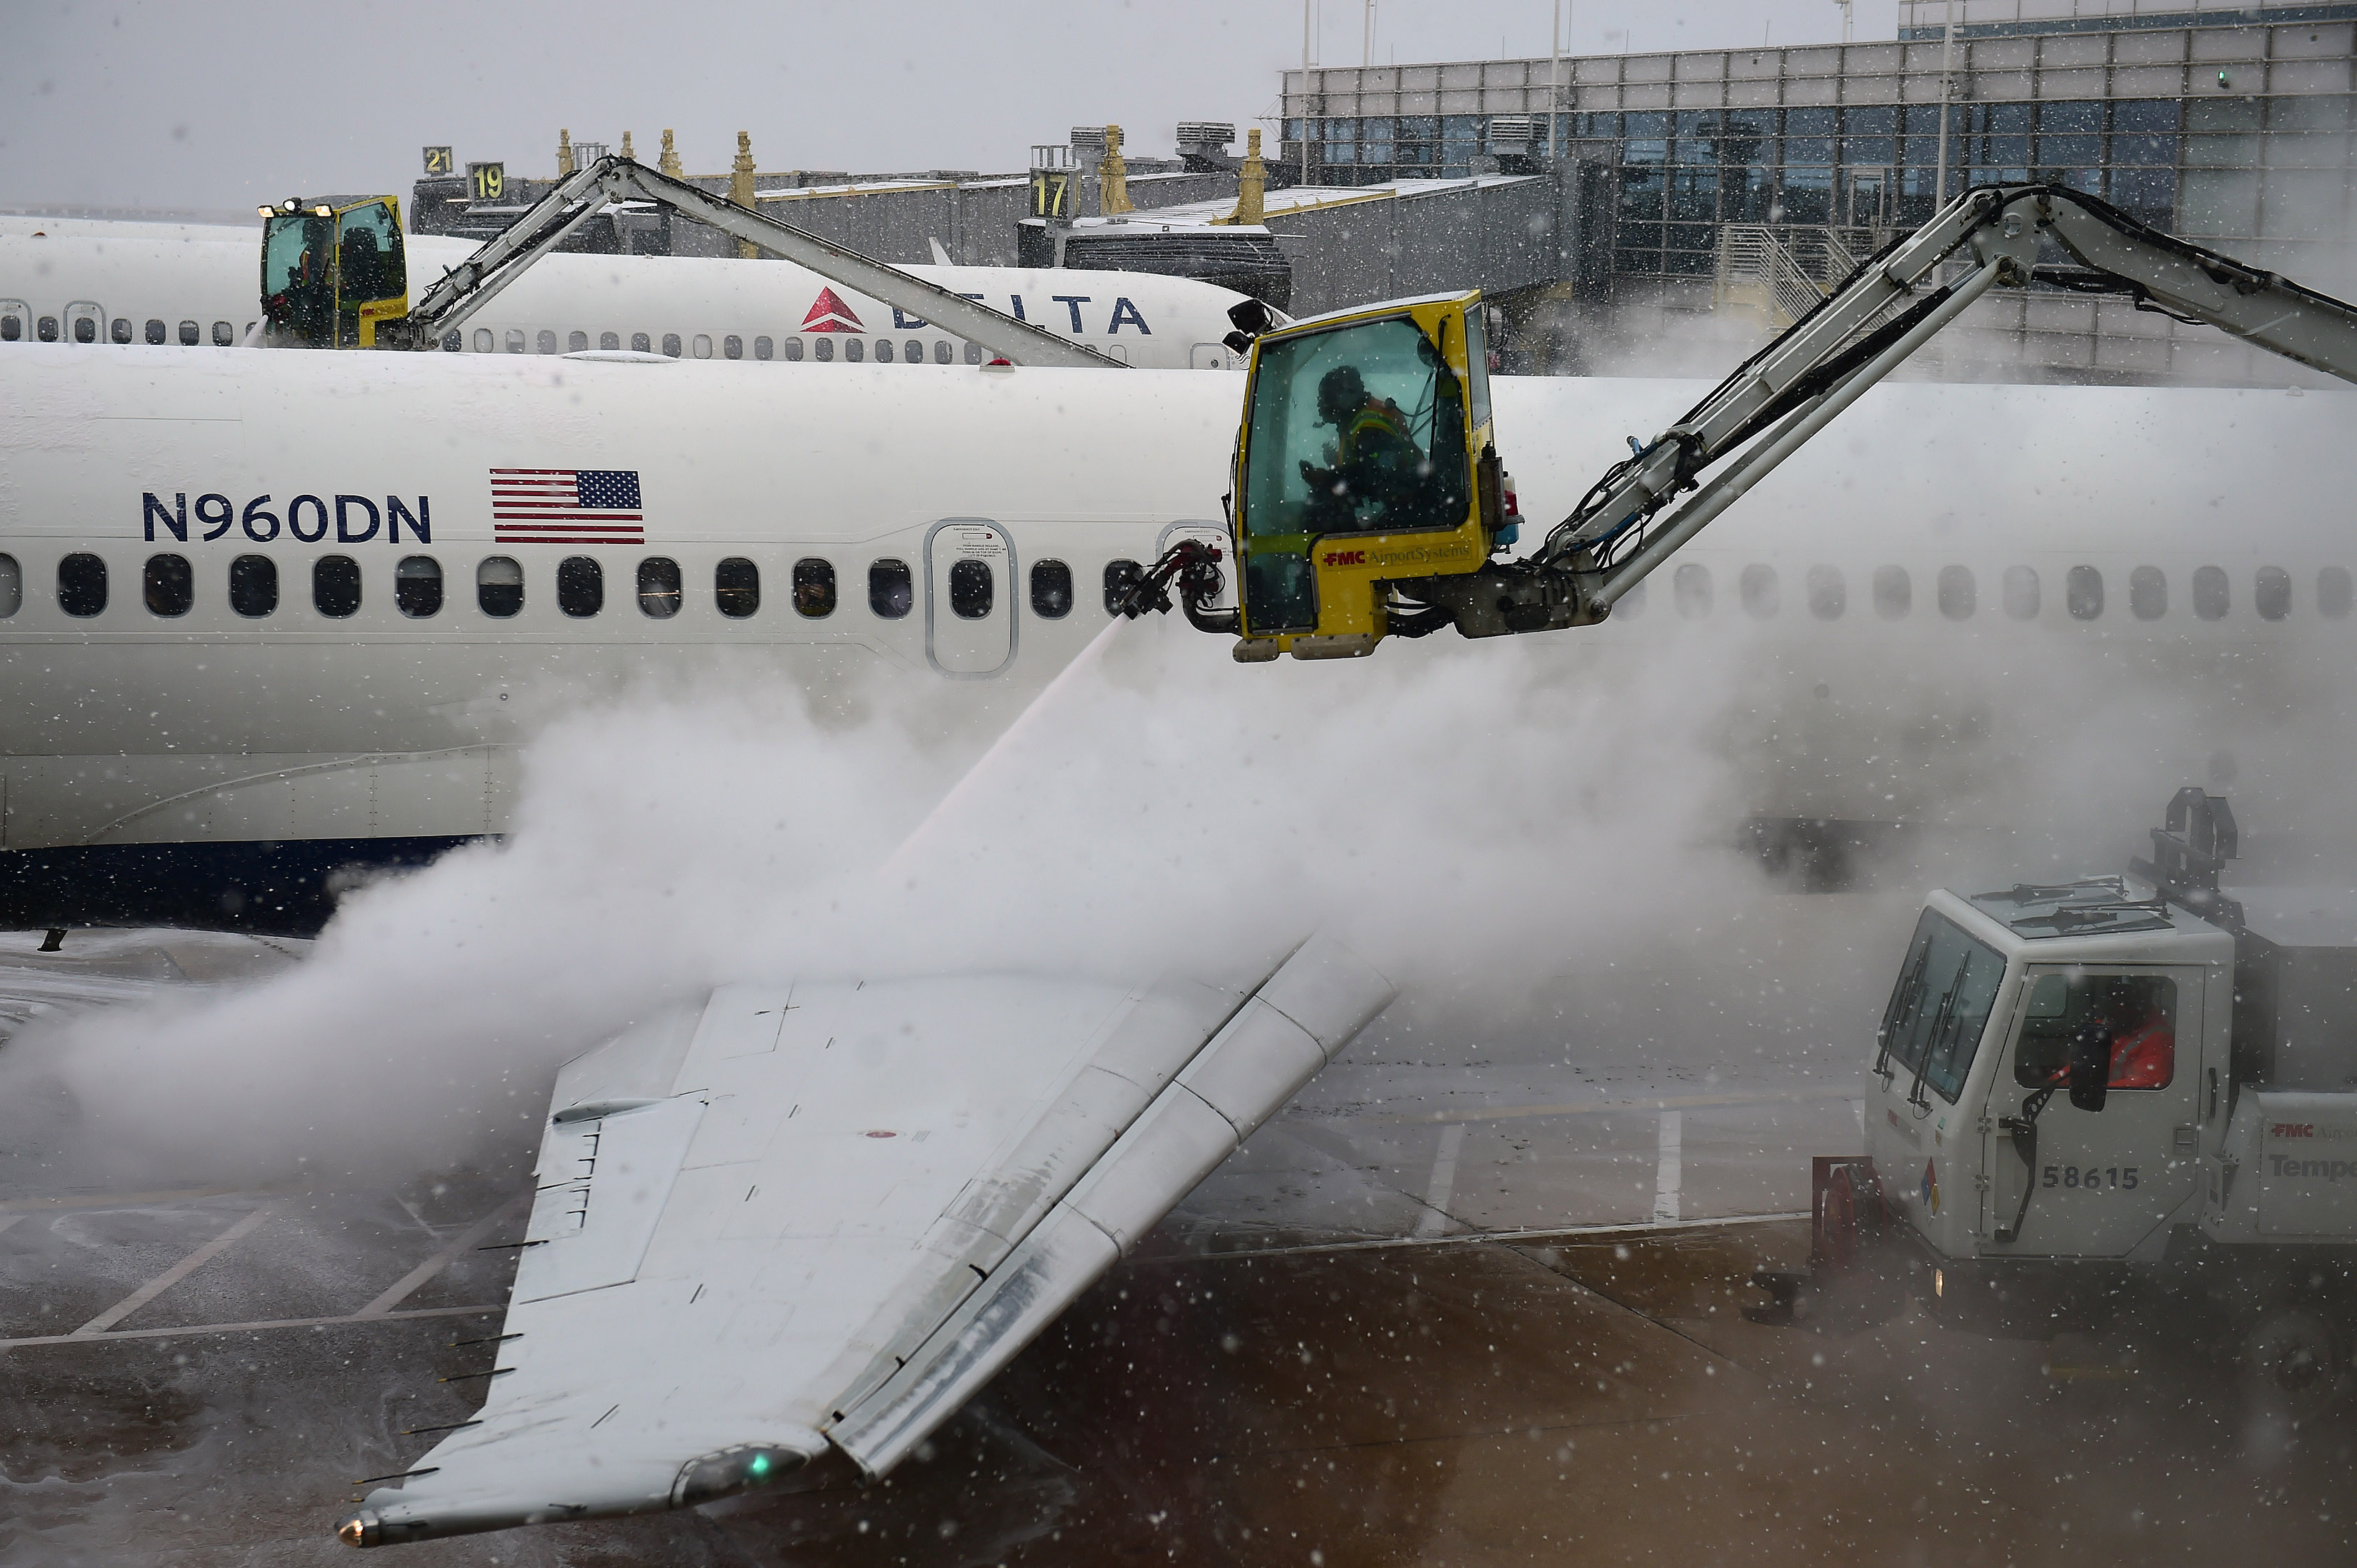 procedure dei piloti quando nevica